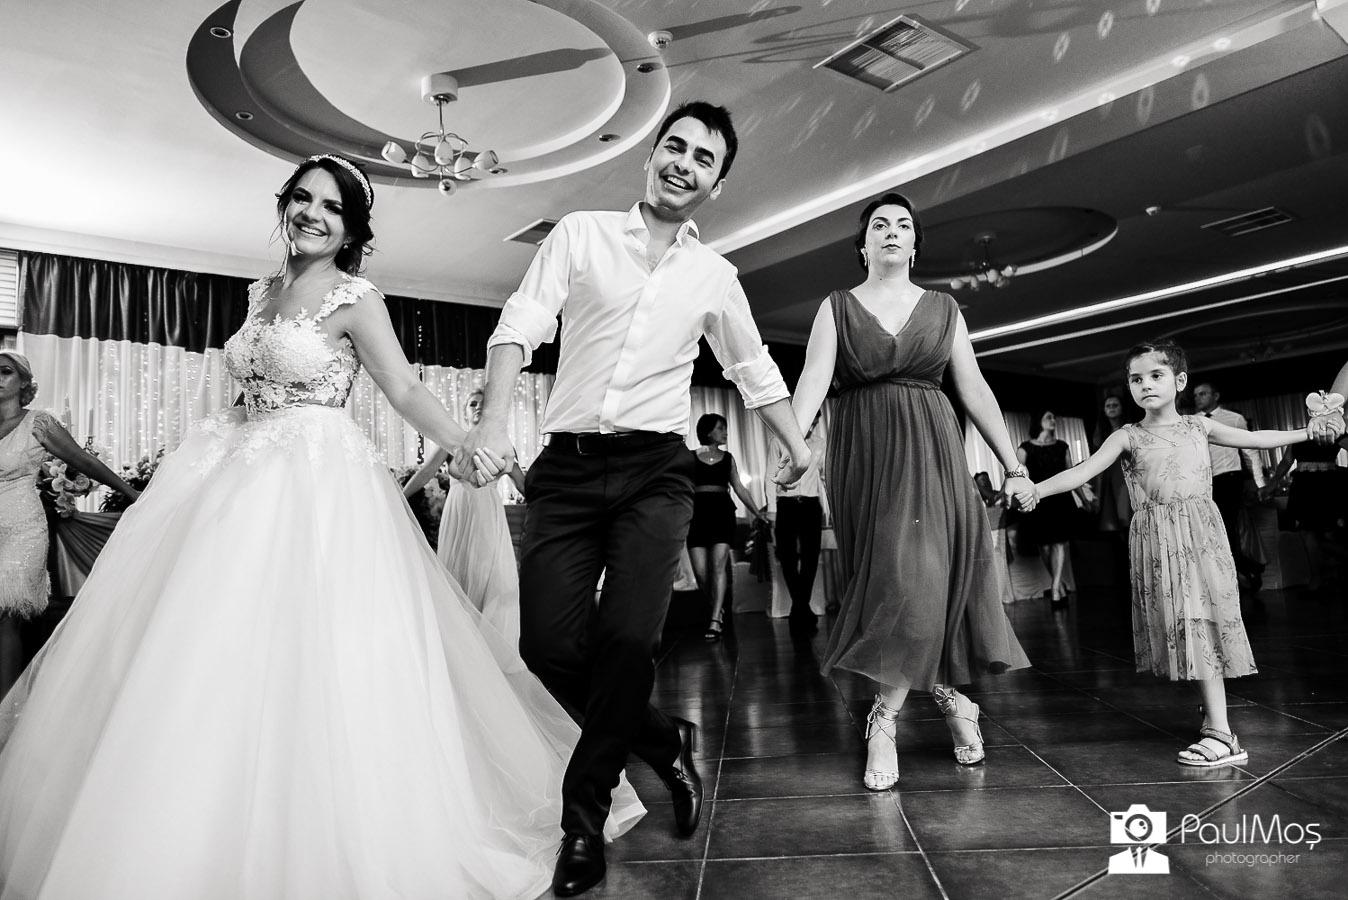 Servicii foto video, nunta, resita, fotograf nunta, fotograf resita